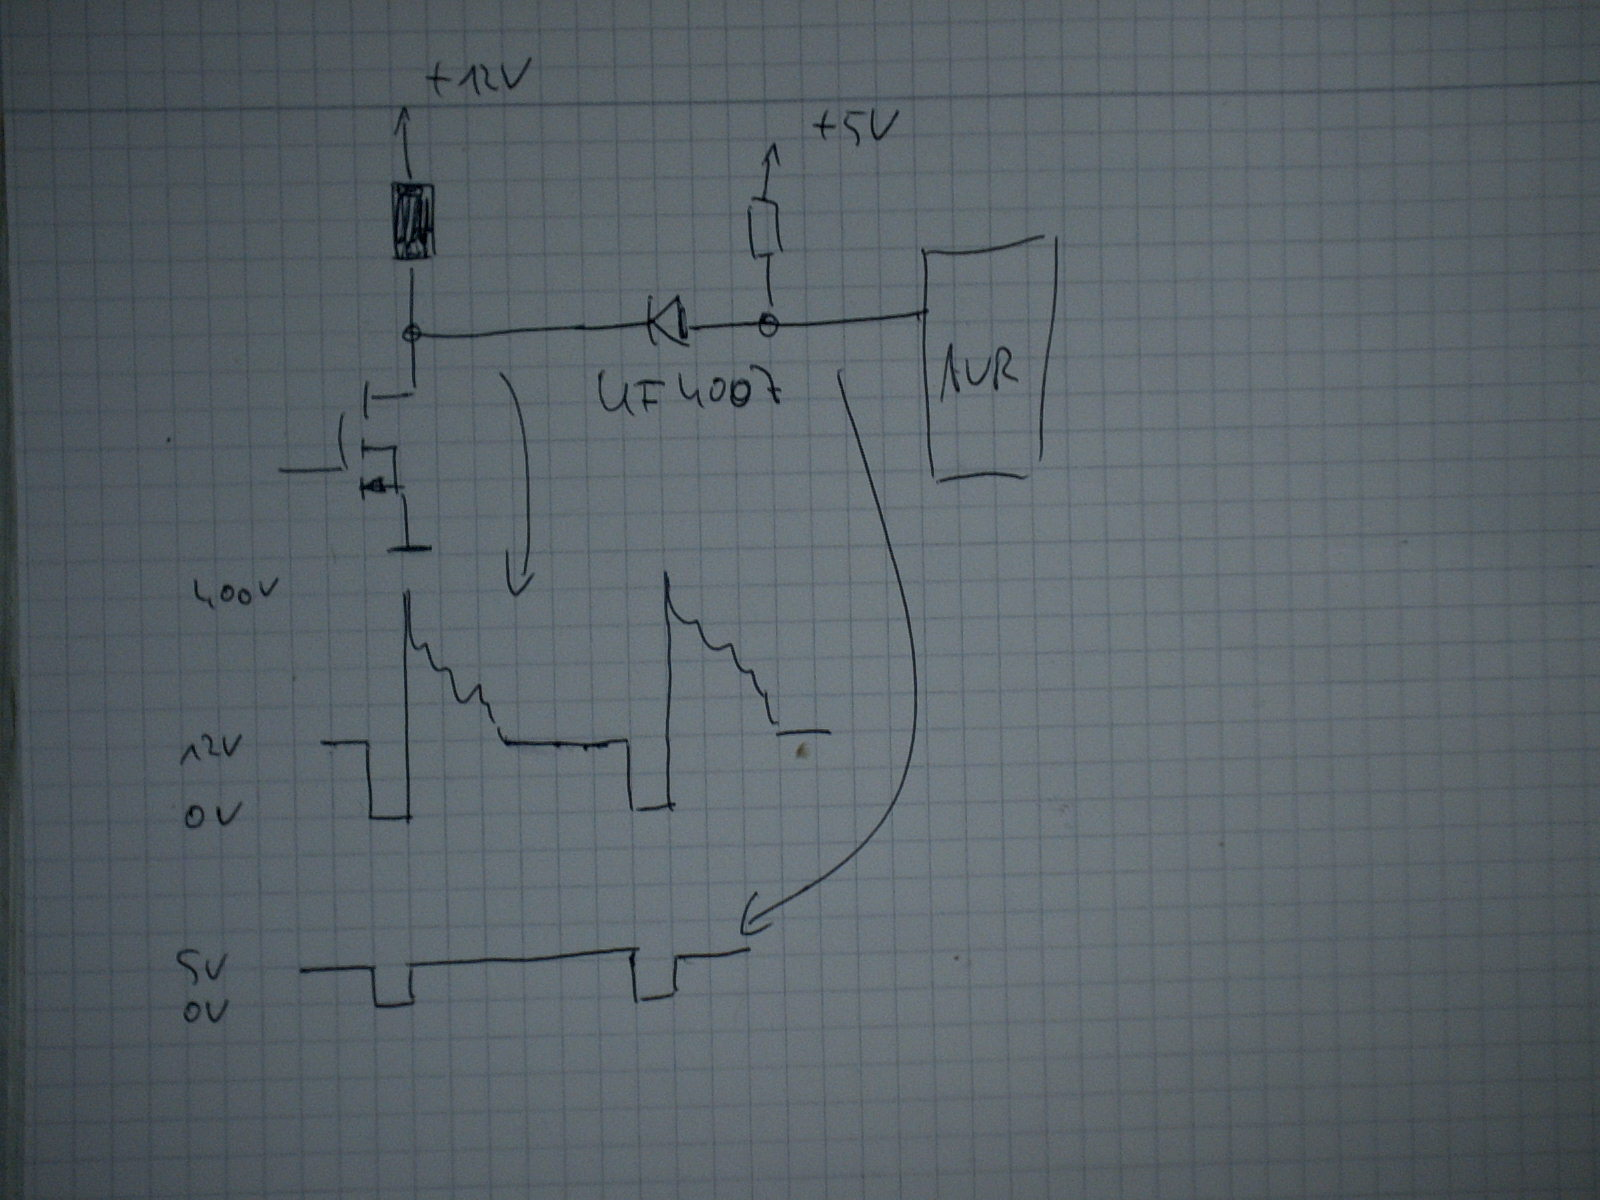 Drehzahlmesser; Elektronik - Mikrocontroller.net